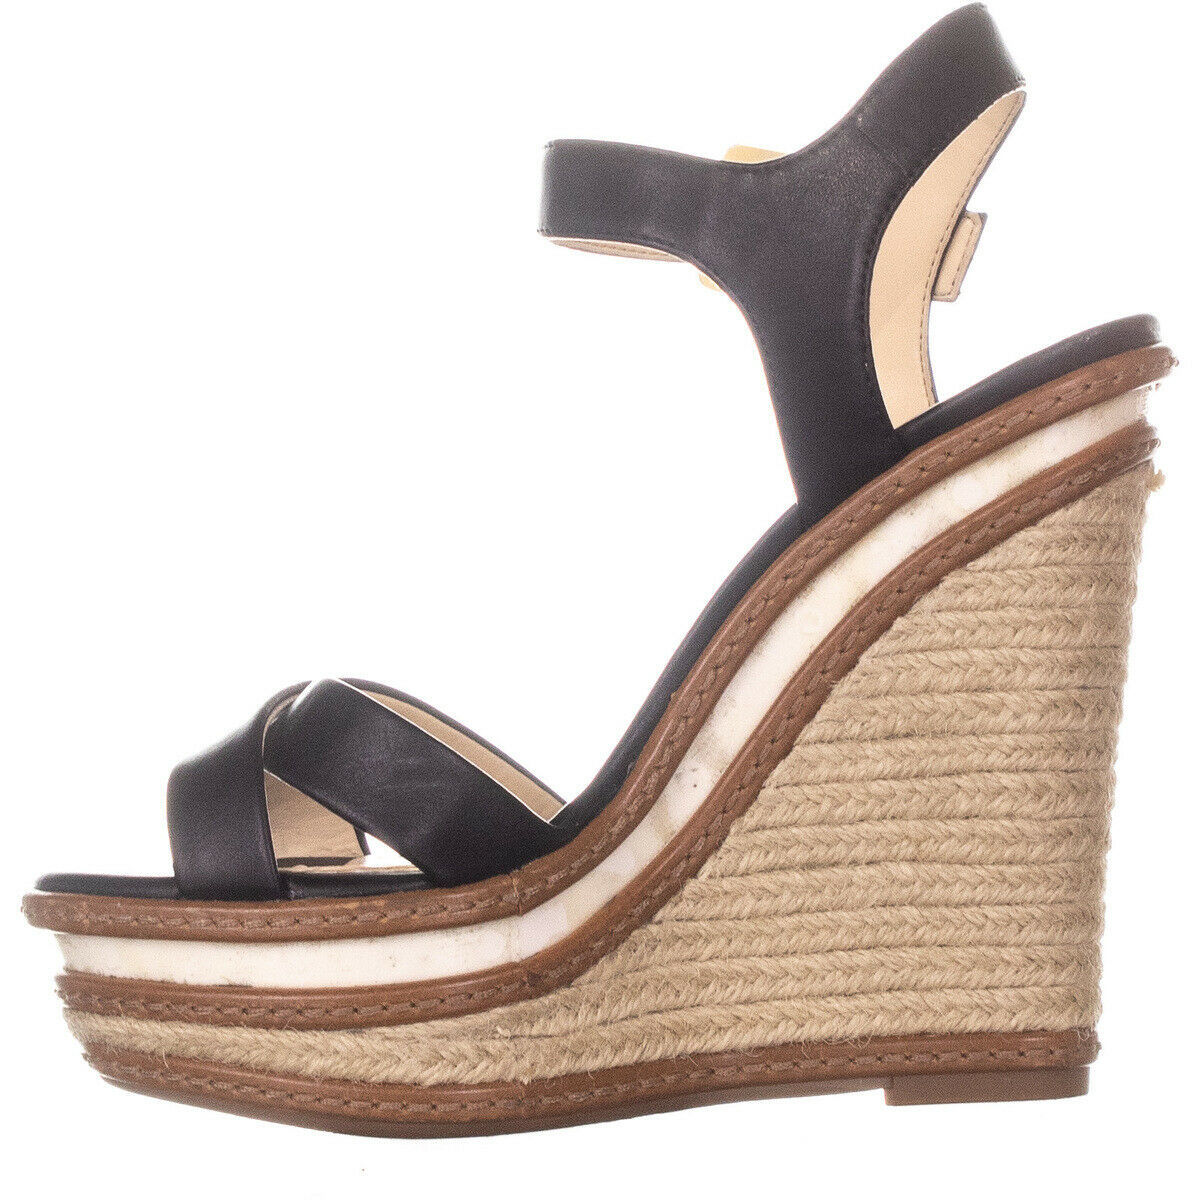 Jessica Simpson Aeralin Wedge Slingback Sandals Black 822